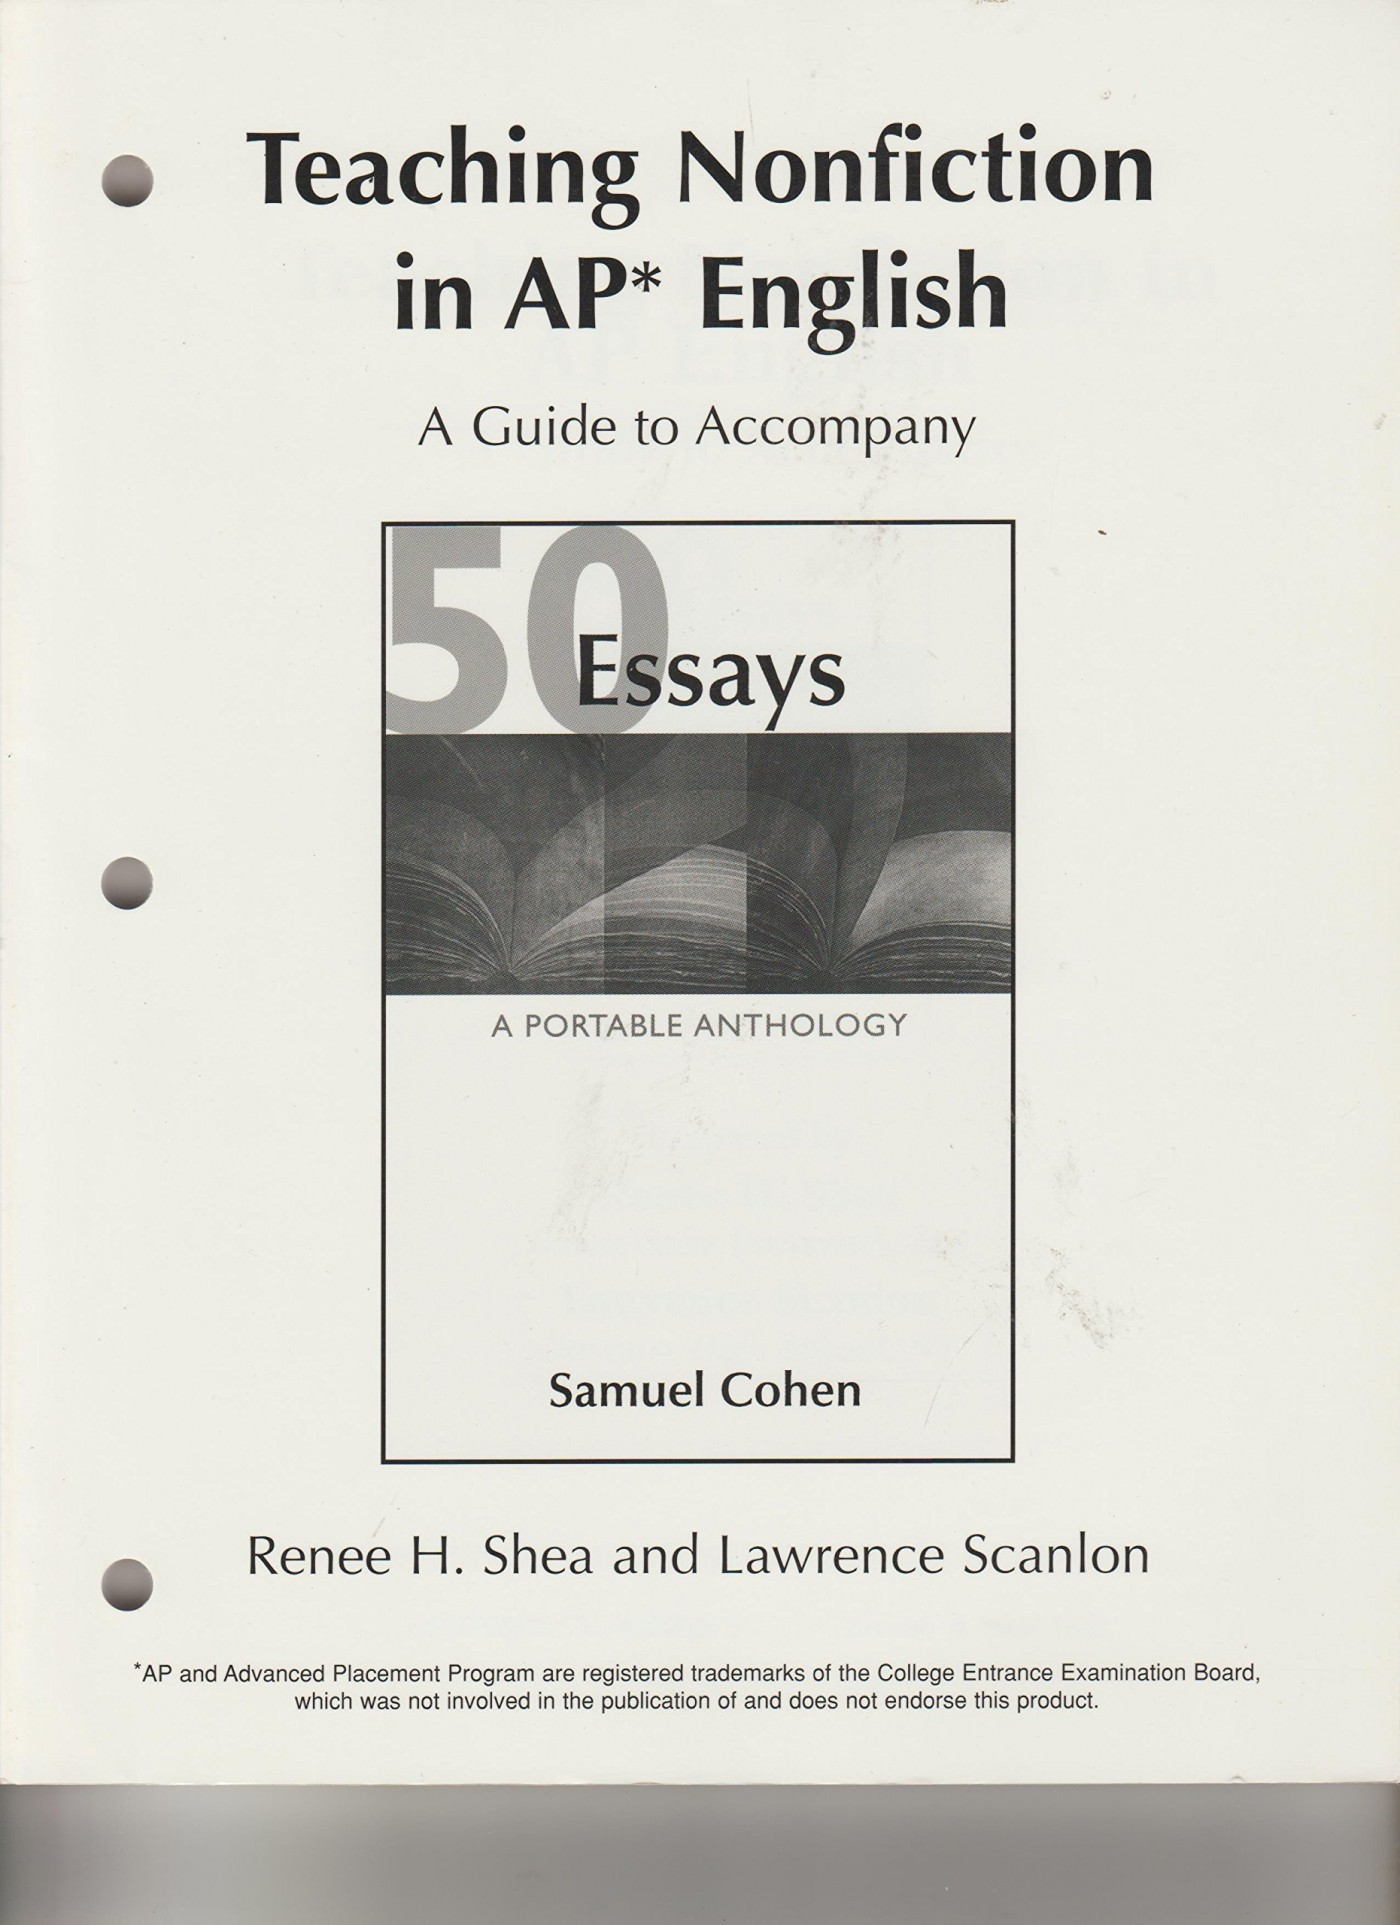 013 Essay Example 81qzov2hjtl Essays Portable Anthology 4th Edition Awful 50 A Pdf Free 1400